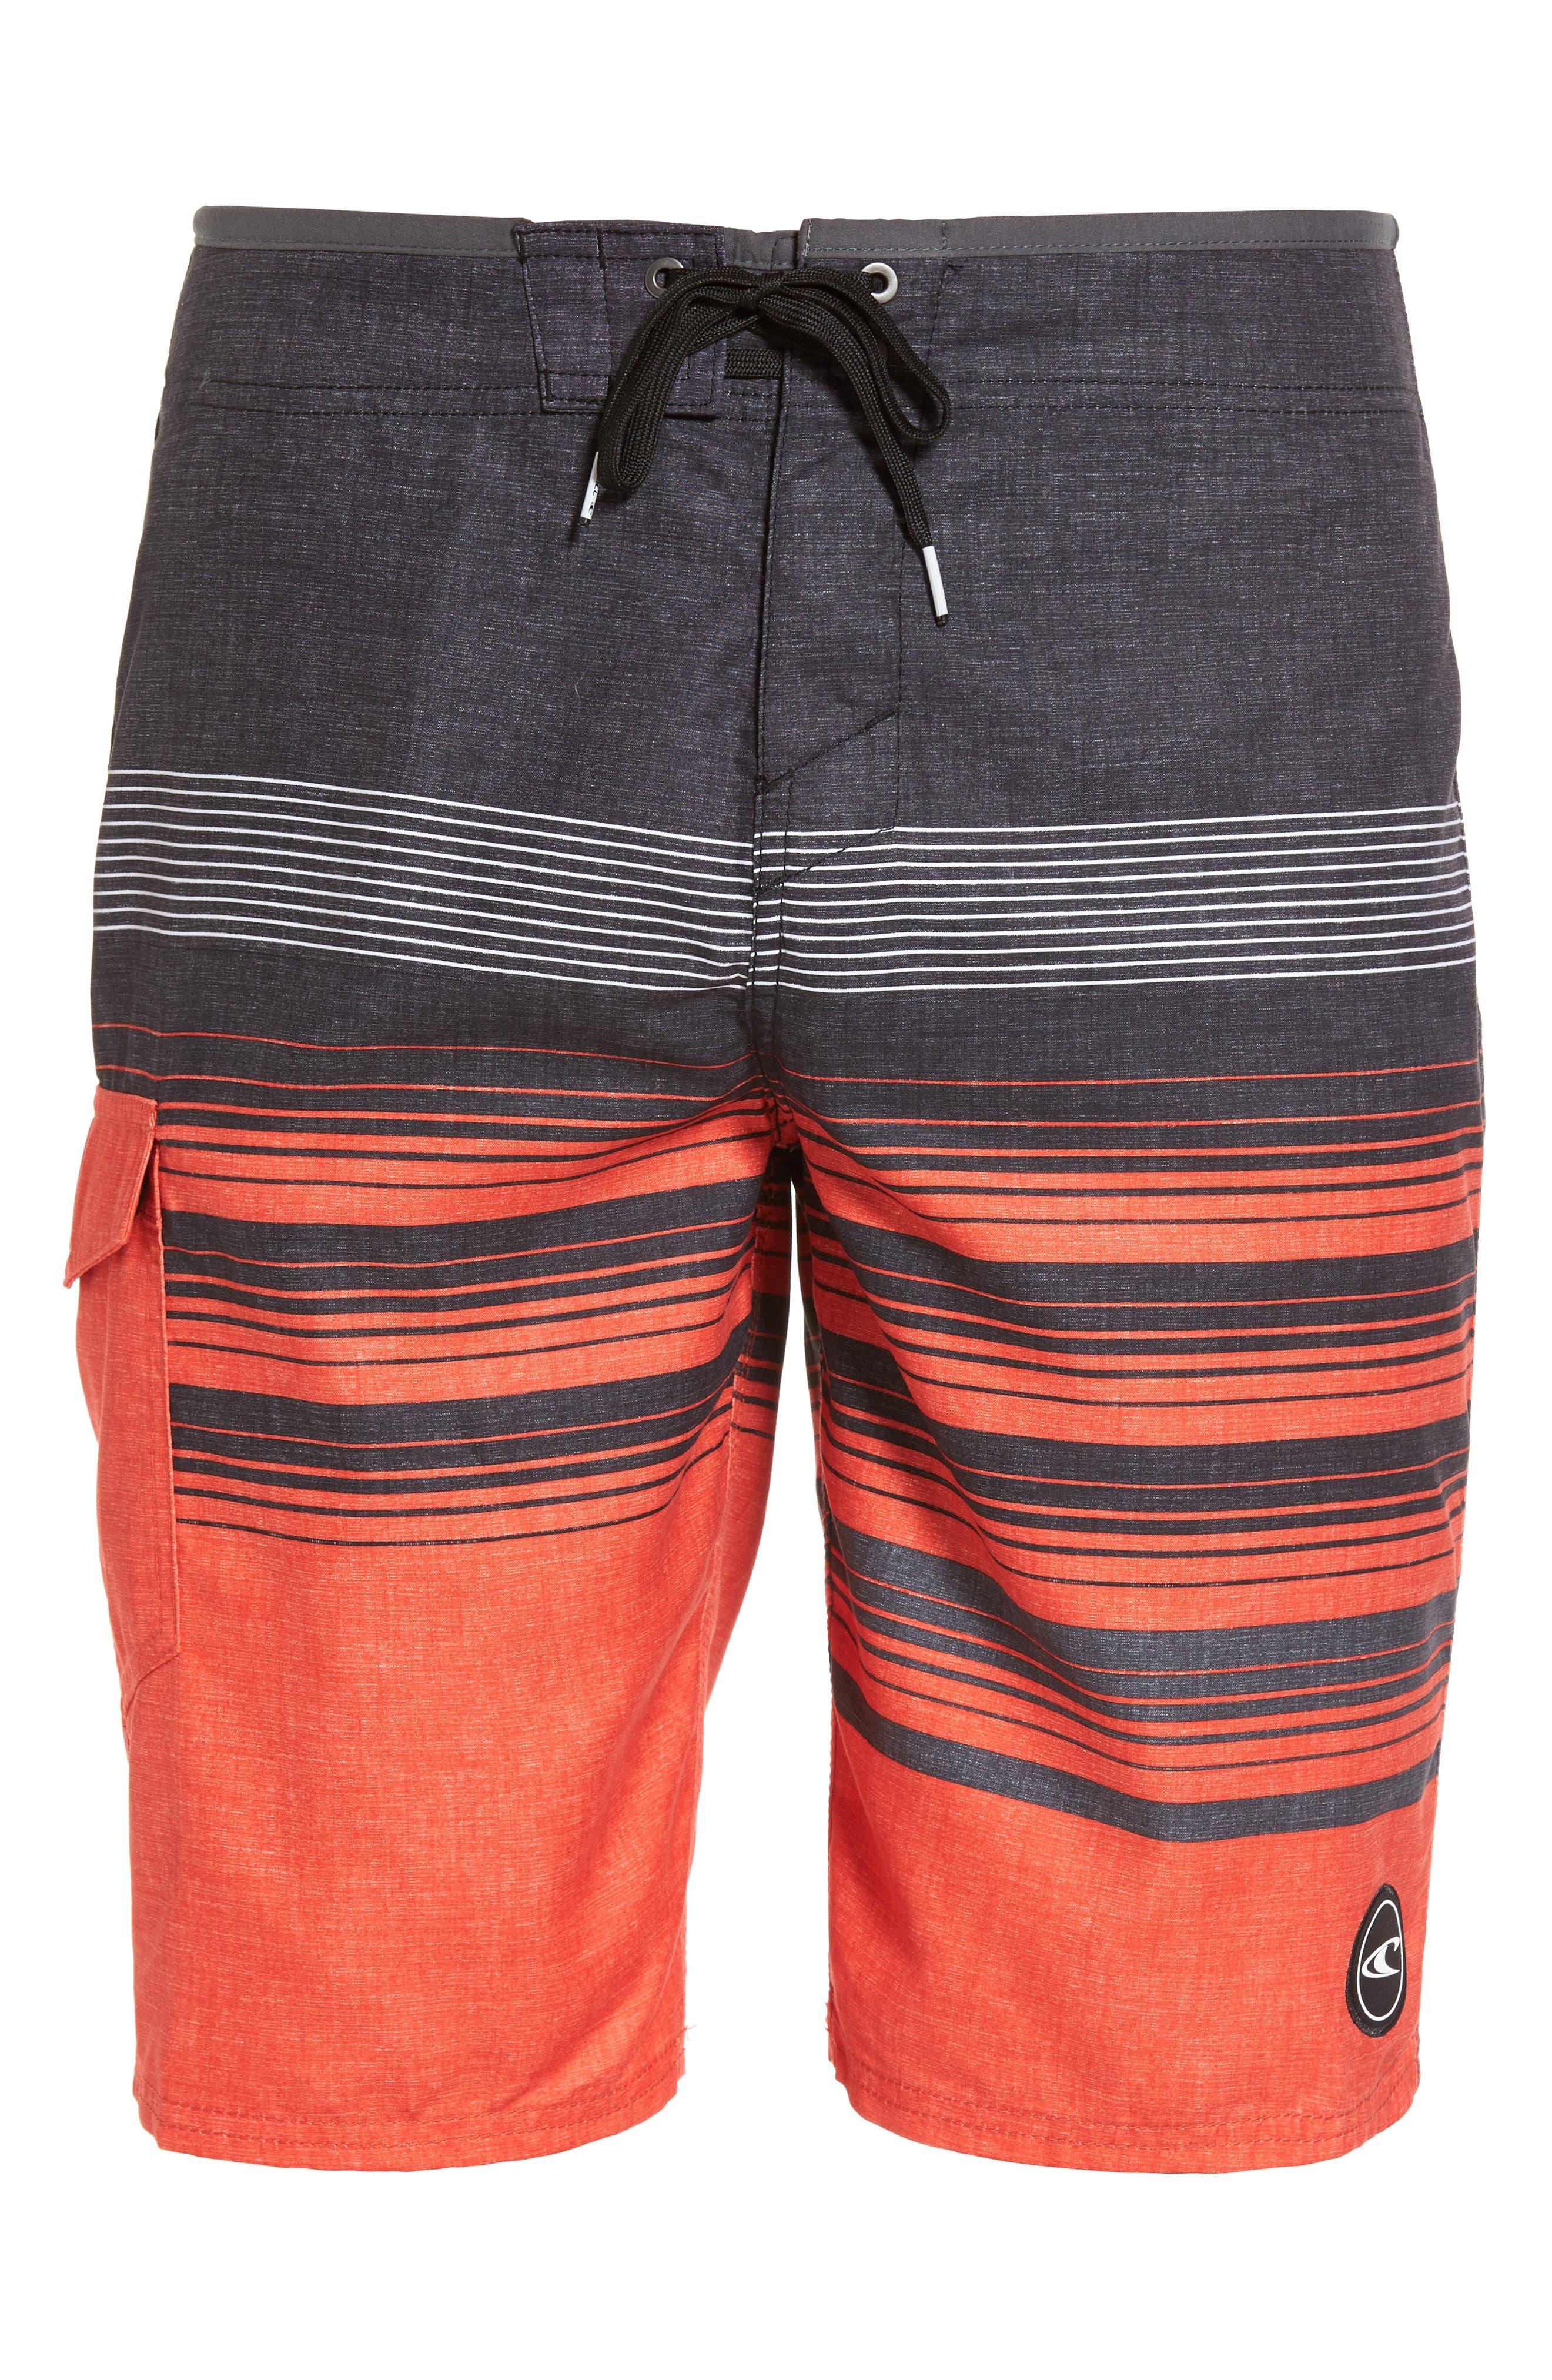 Lennox Board Shorts,                             Alternate thumbnail 6, color,                             Neon Red